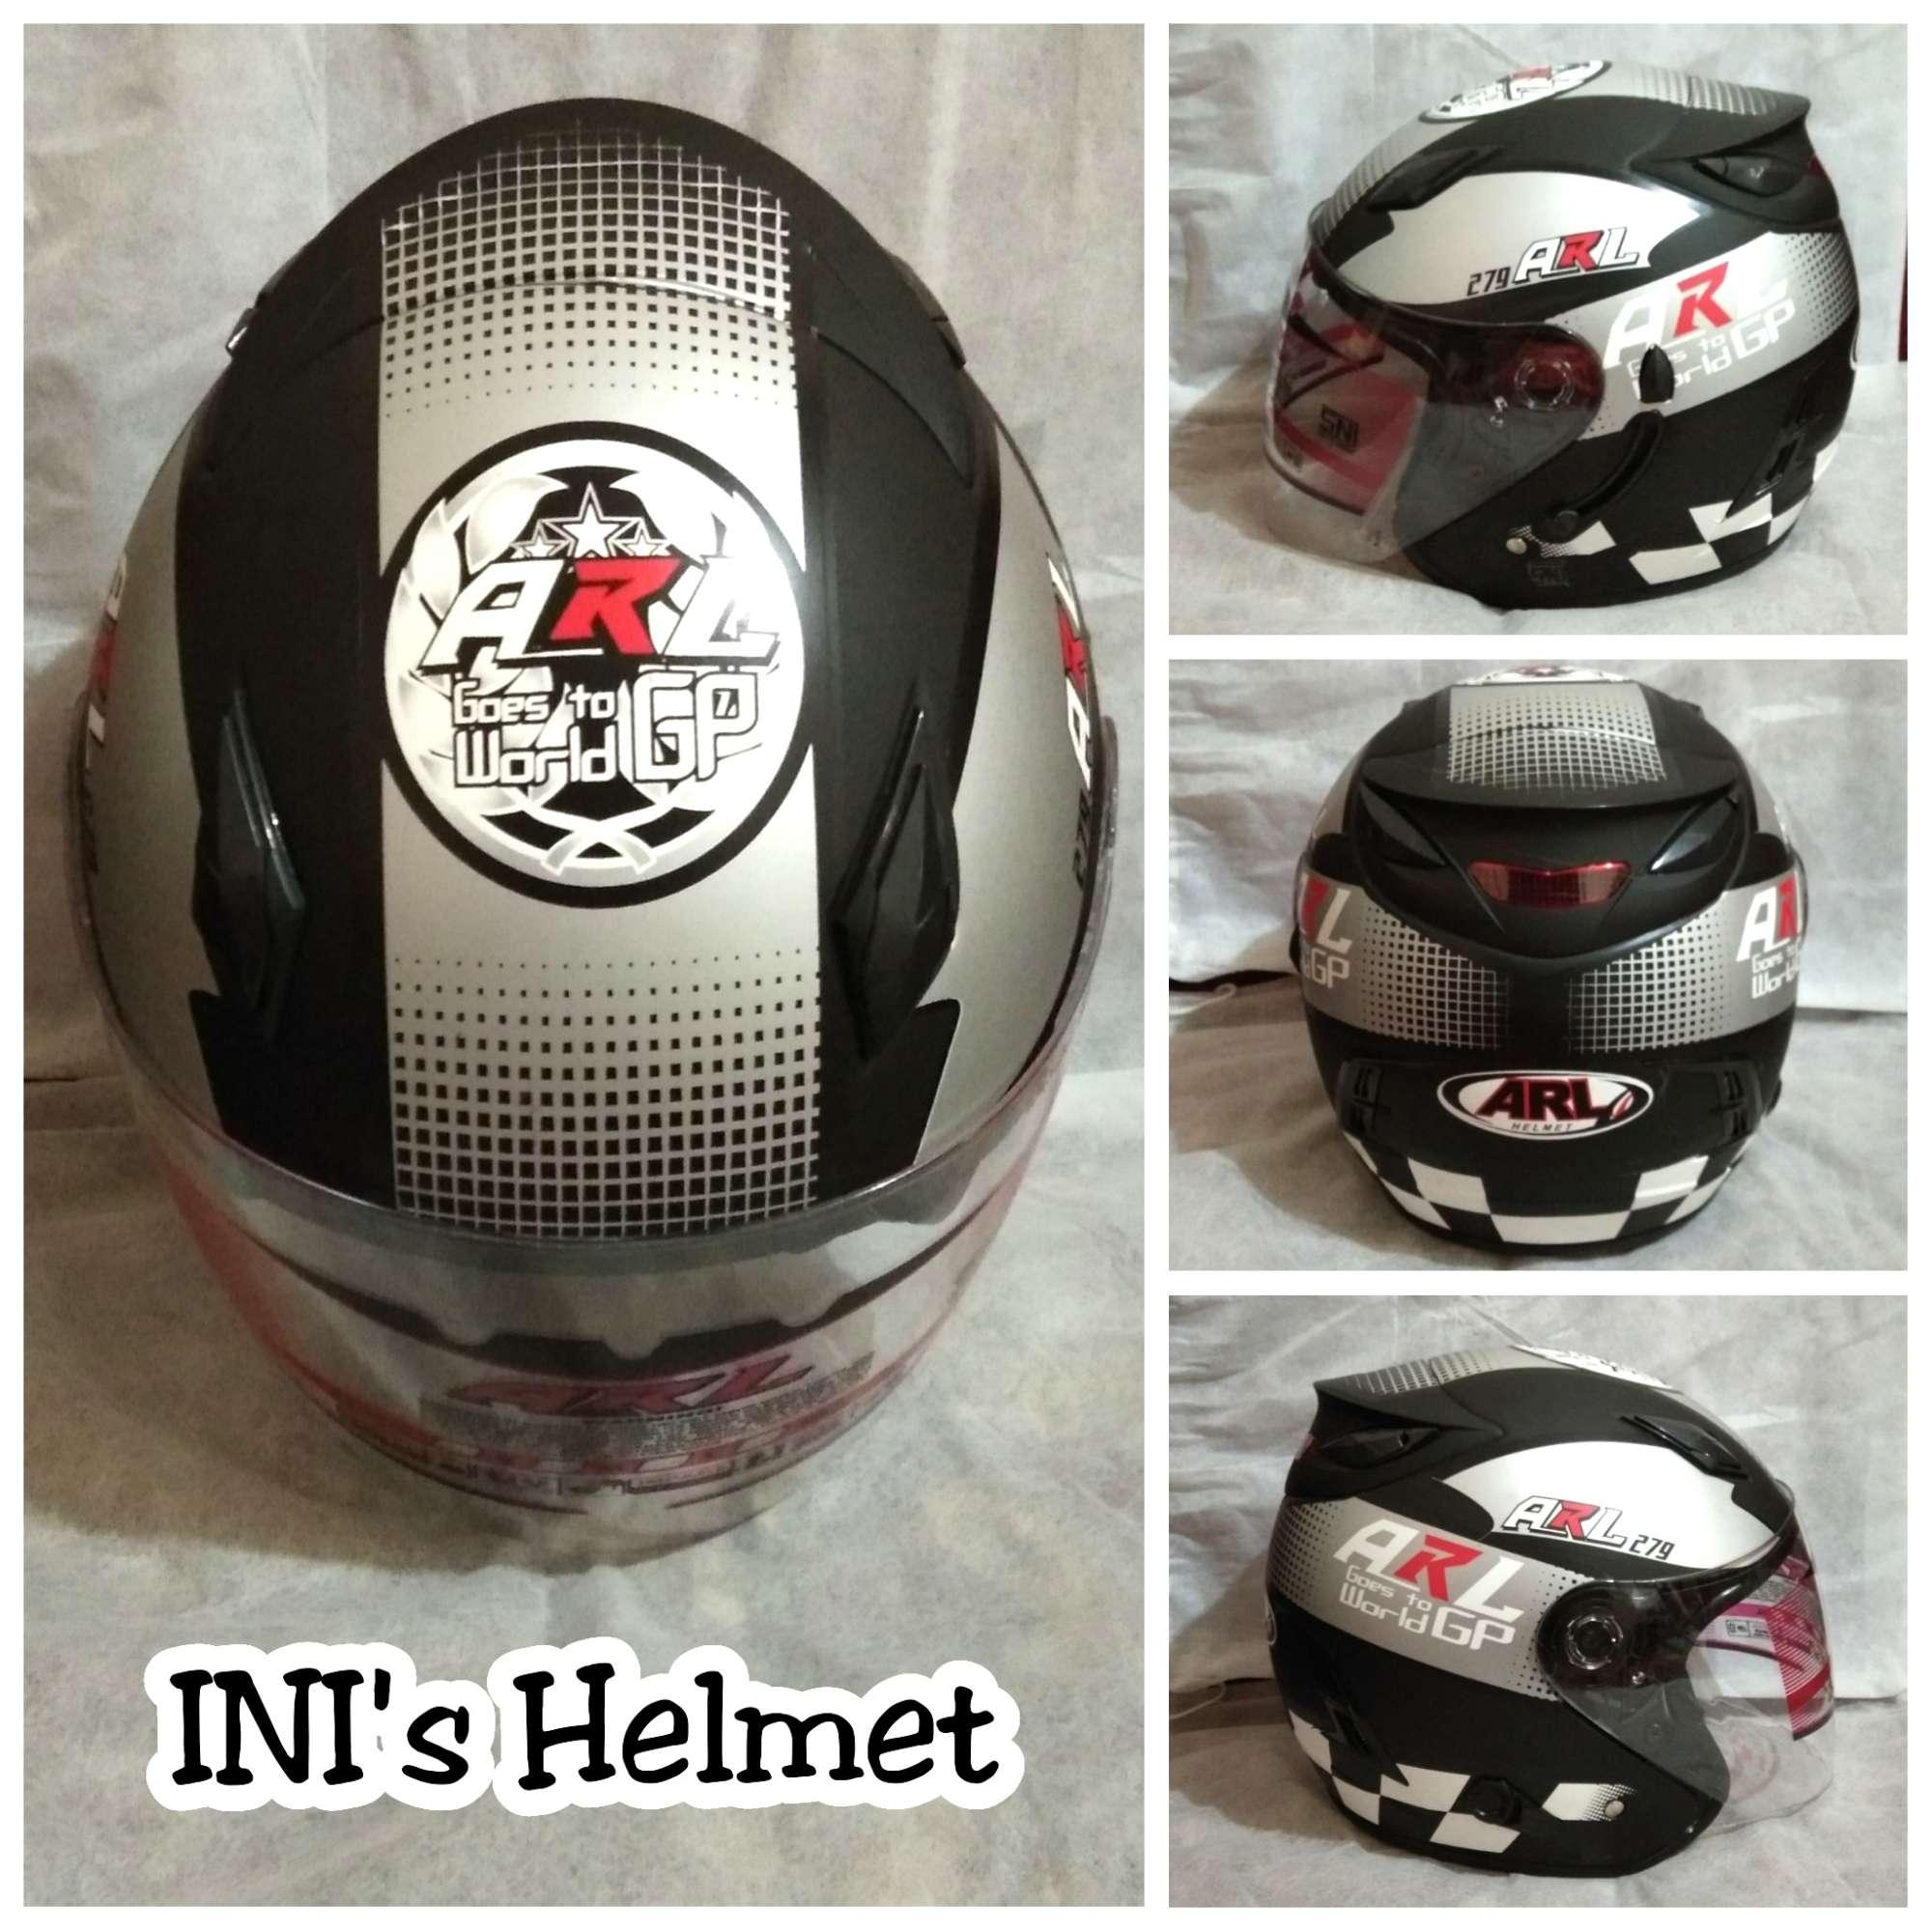 Kaca Helm Ink Centro Dan Kyt Dj Maru Galaxy Hitam Daftar Harga Djmaru Warna Bening Merk Clean Arl Double Visor 2 Motif Doff Moto Gp Sni